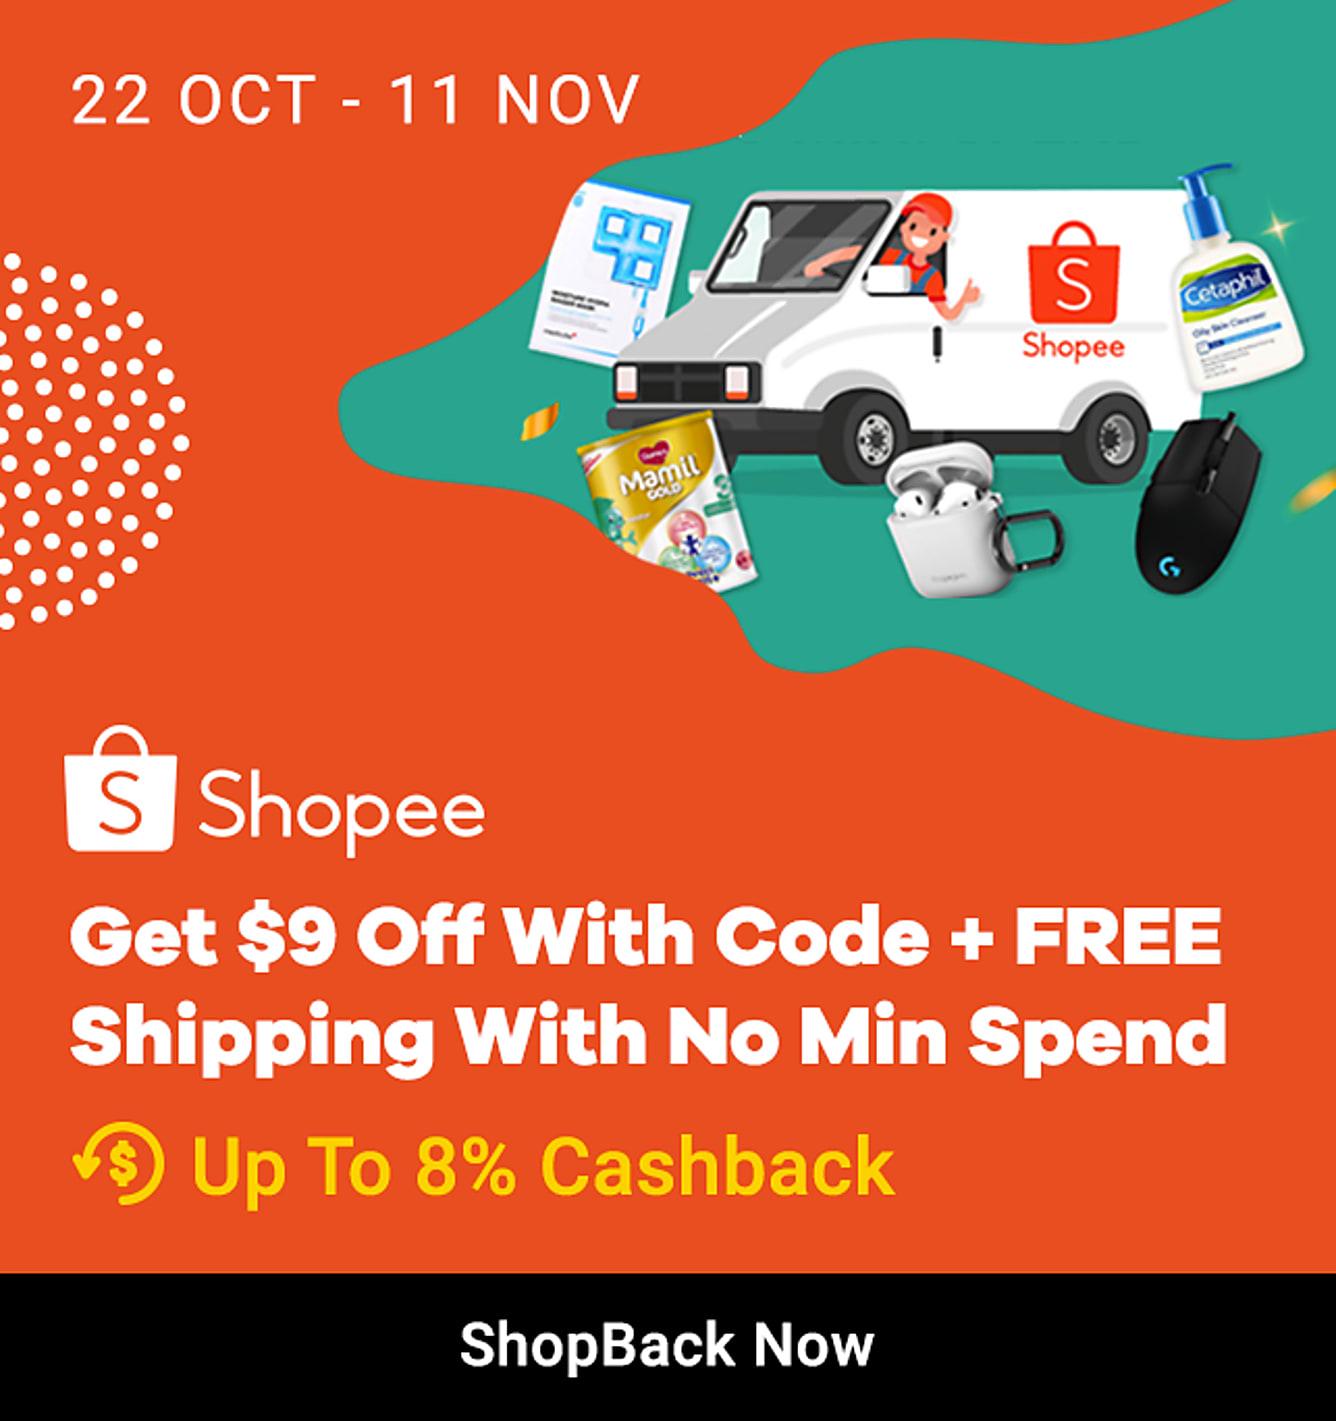 Shopee_Promo Code_11.11.2019_22 Oct-11 Nov